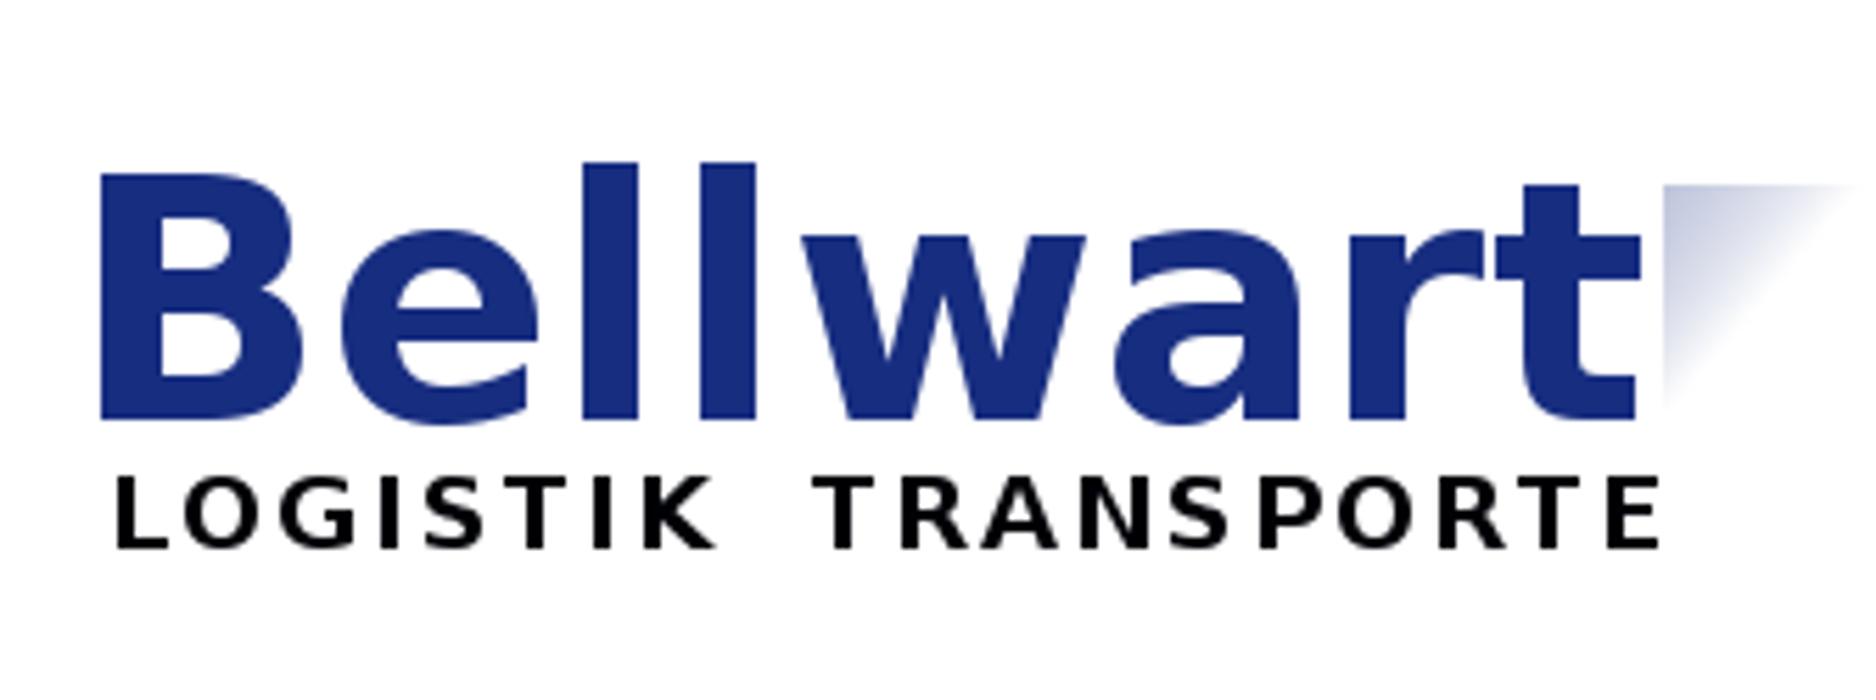 Bellwart Logistik